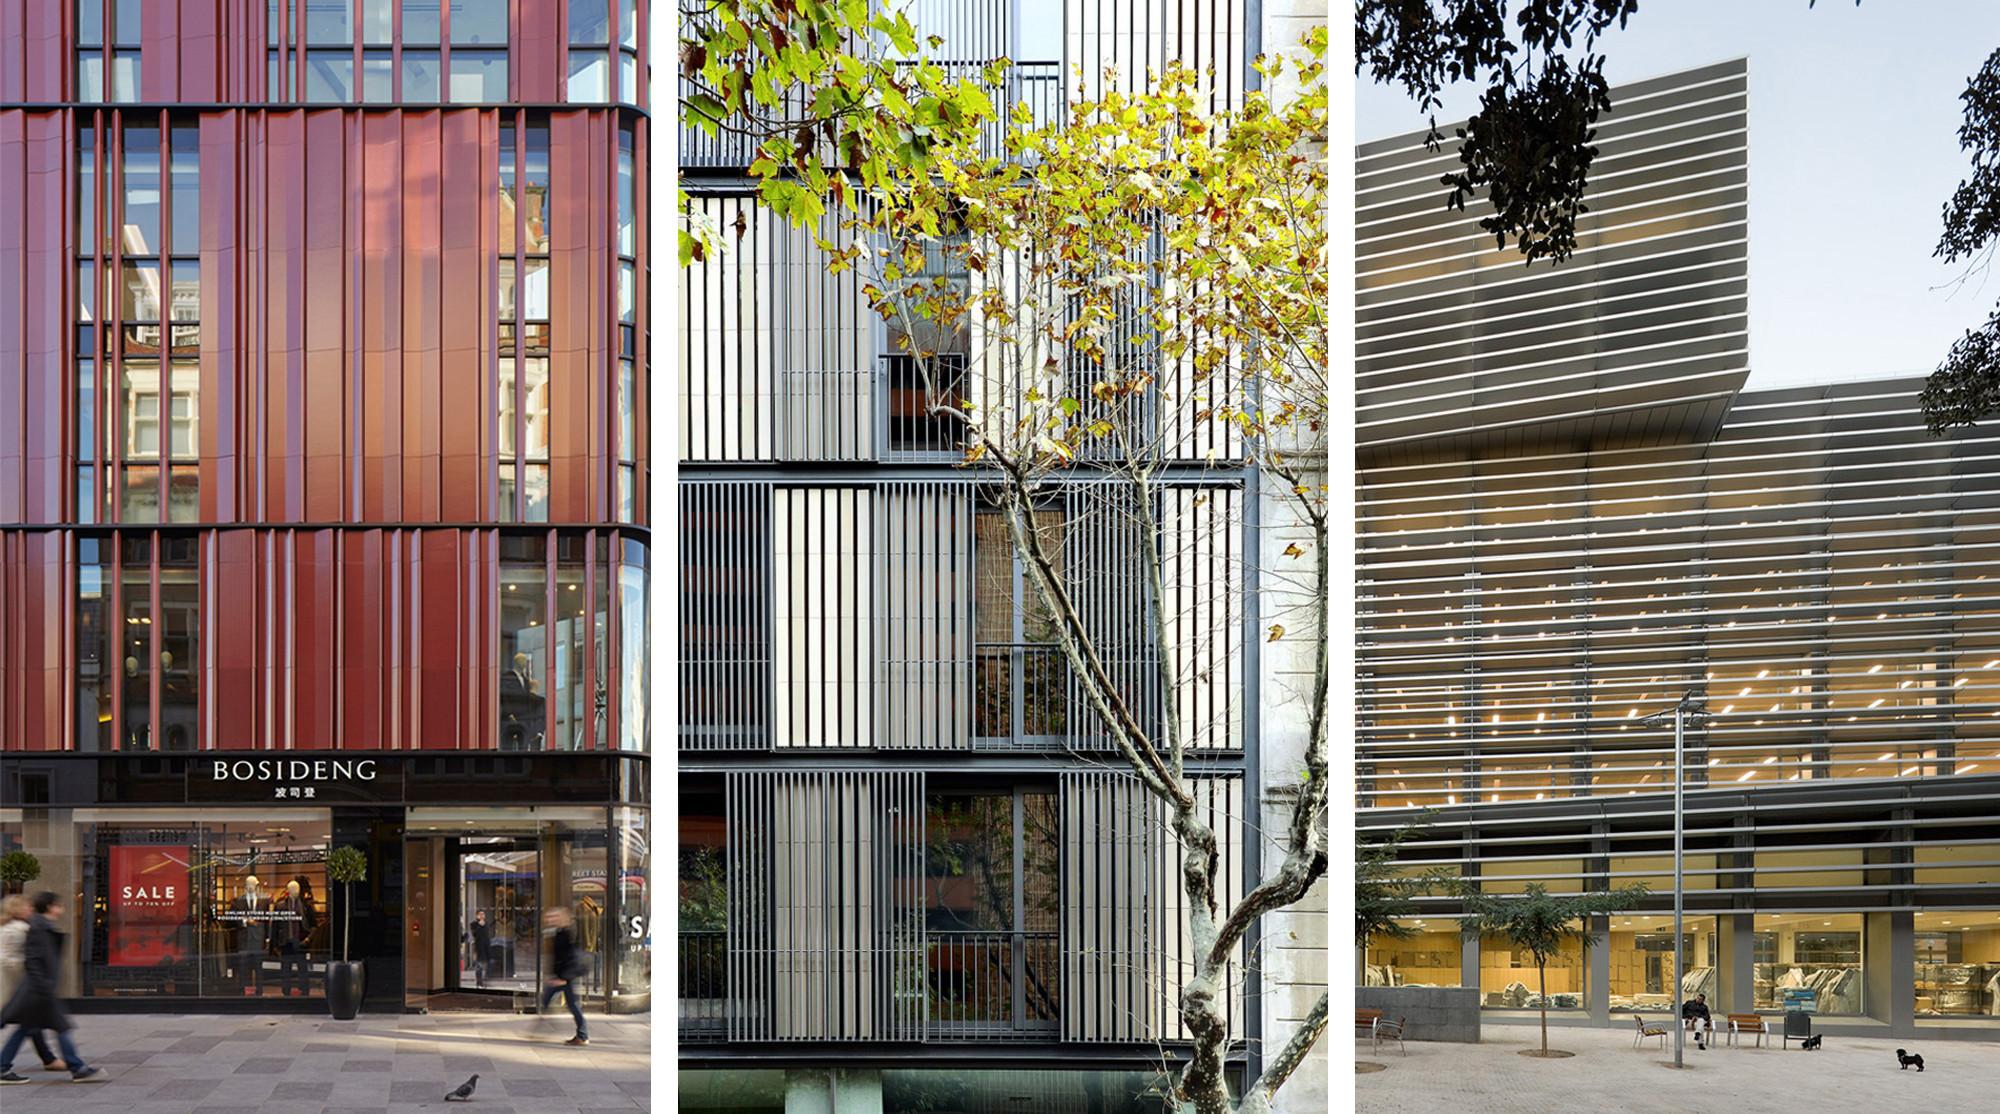 Edificios protecci n solar en fachadas plataforma for Parasoles arquitectura